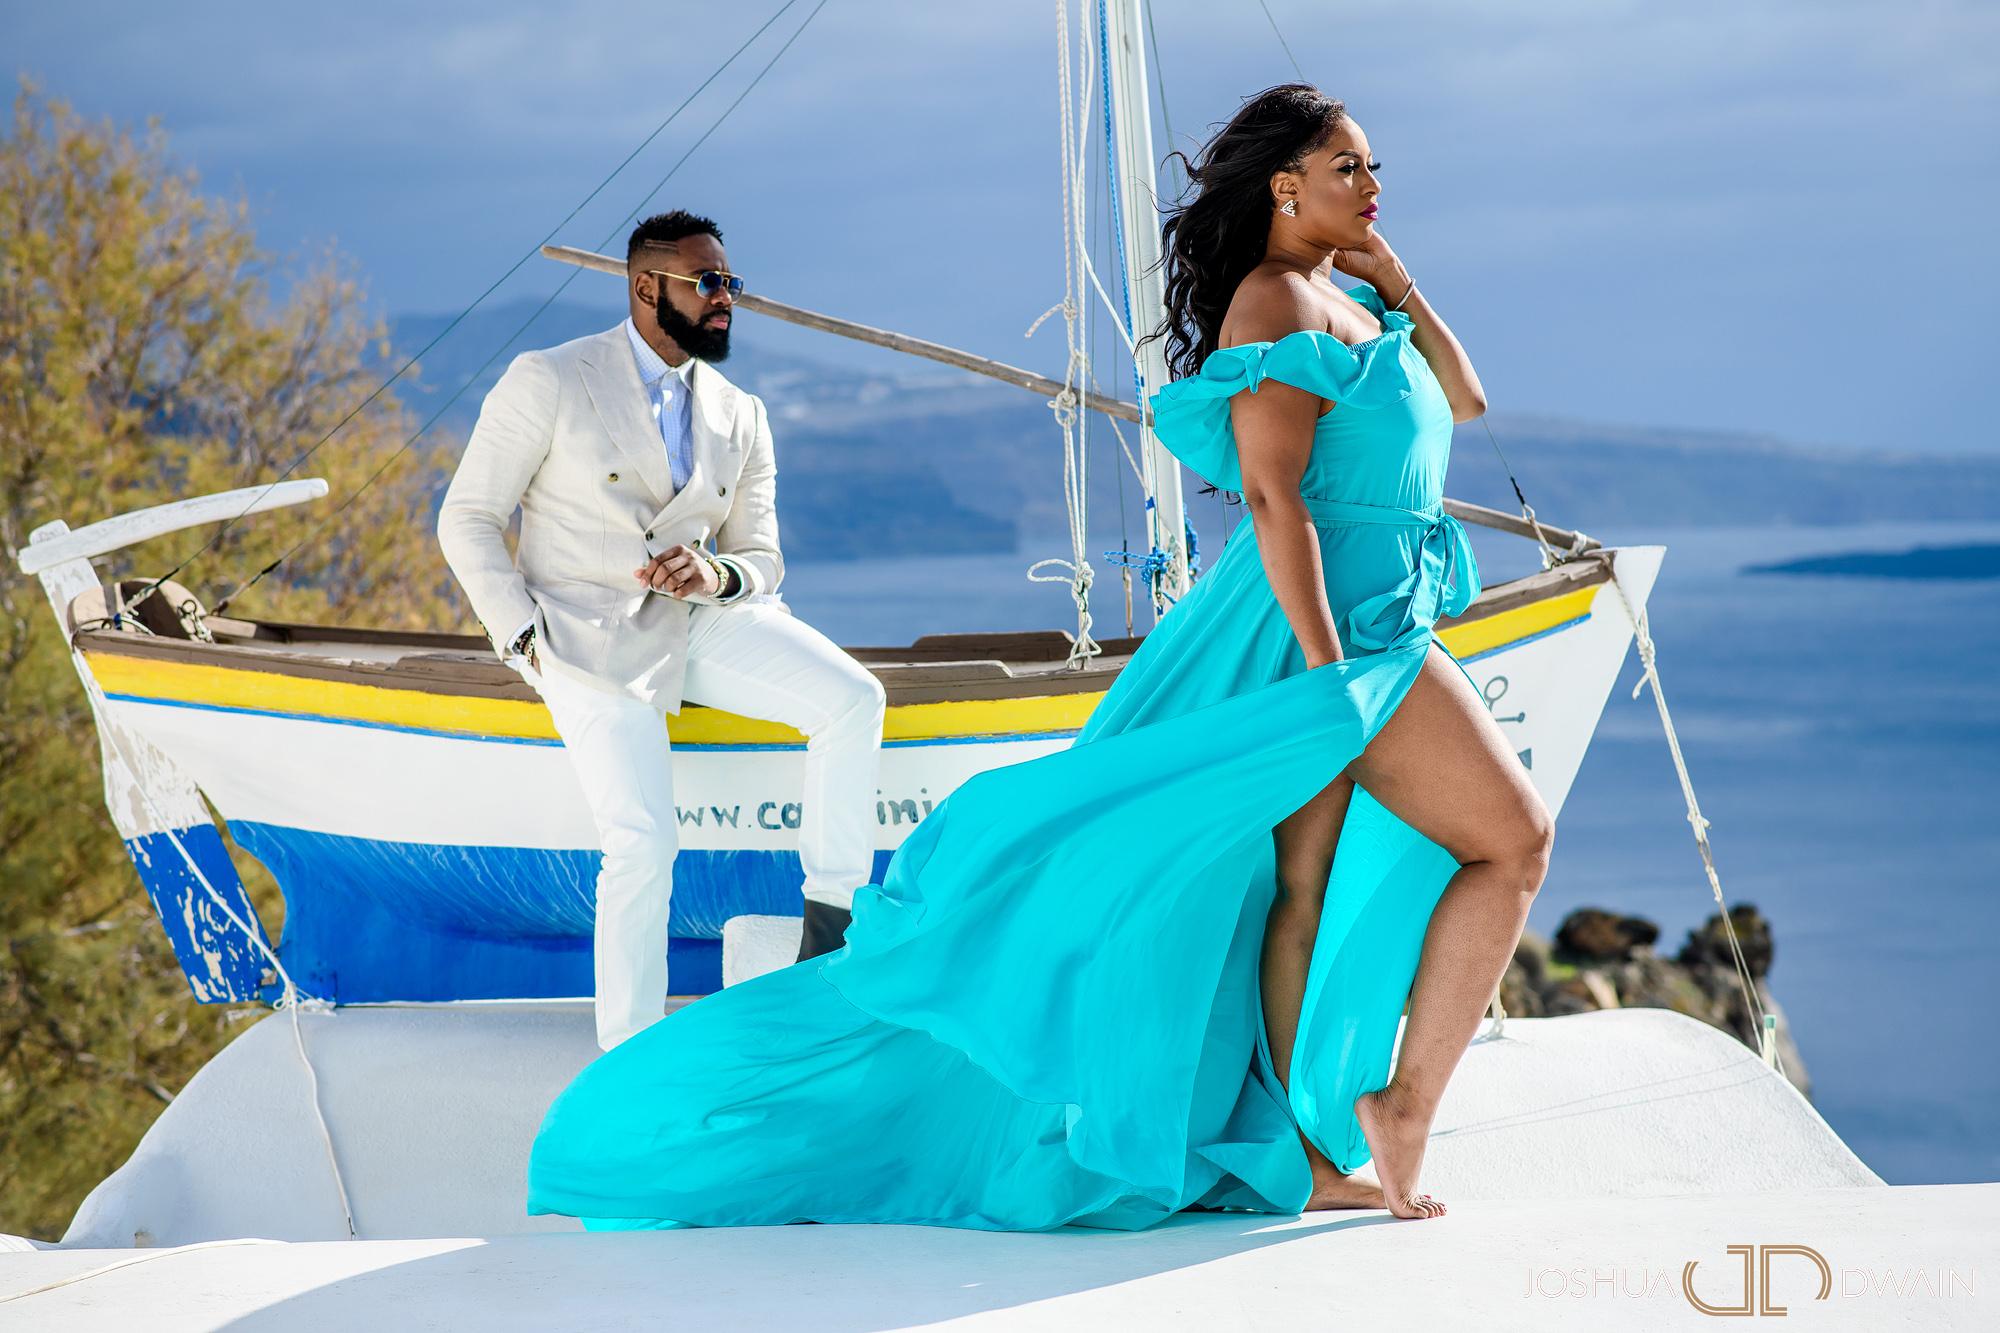 ekene-issac-03-santorini-oia-thira-greece-wedding-engagement-photos-african-american-destination-photographer-joshua-dwain.jpg